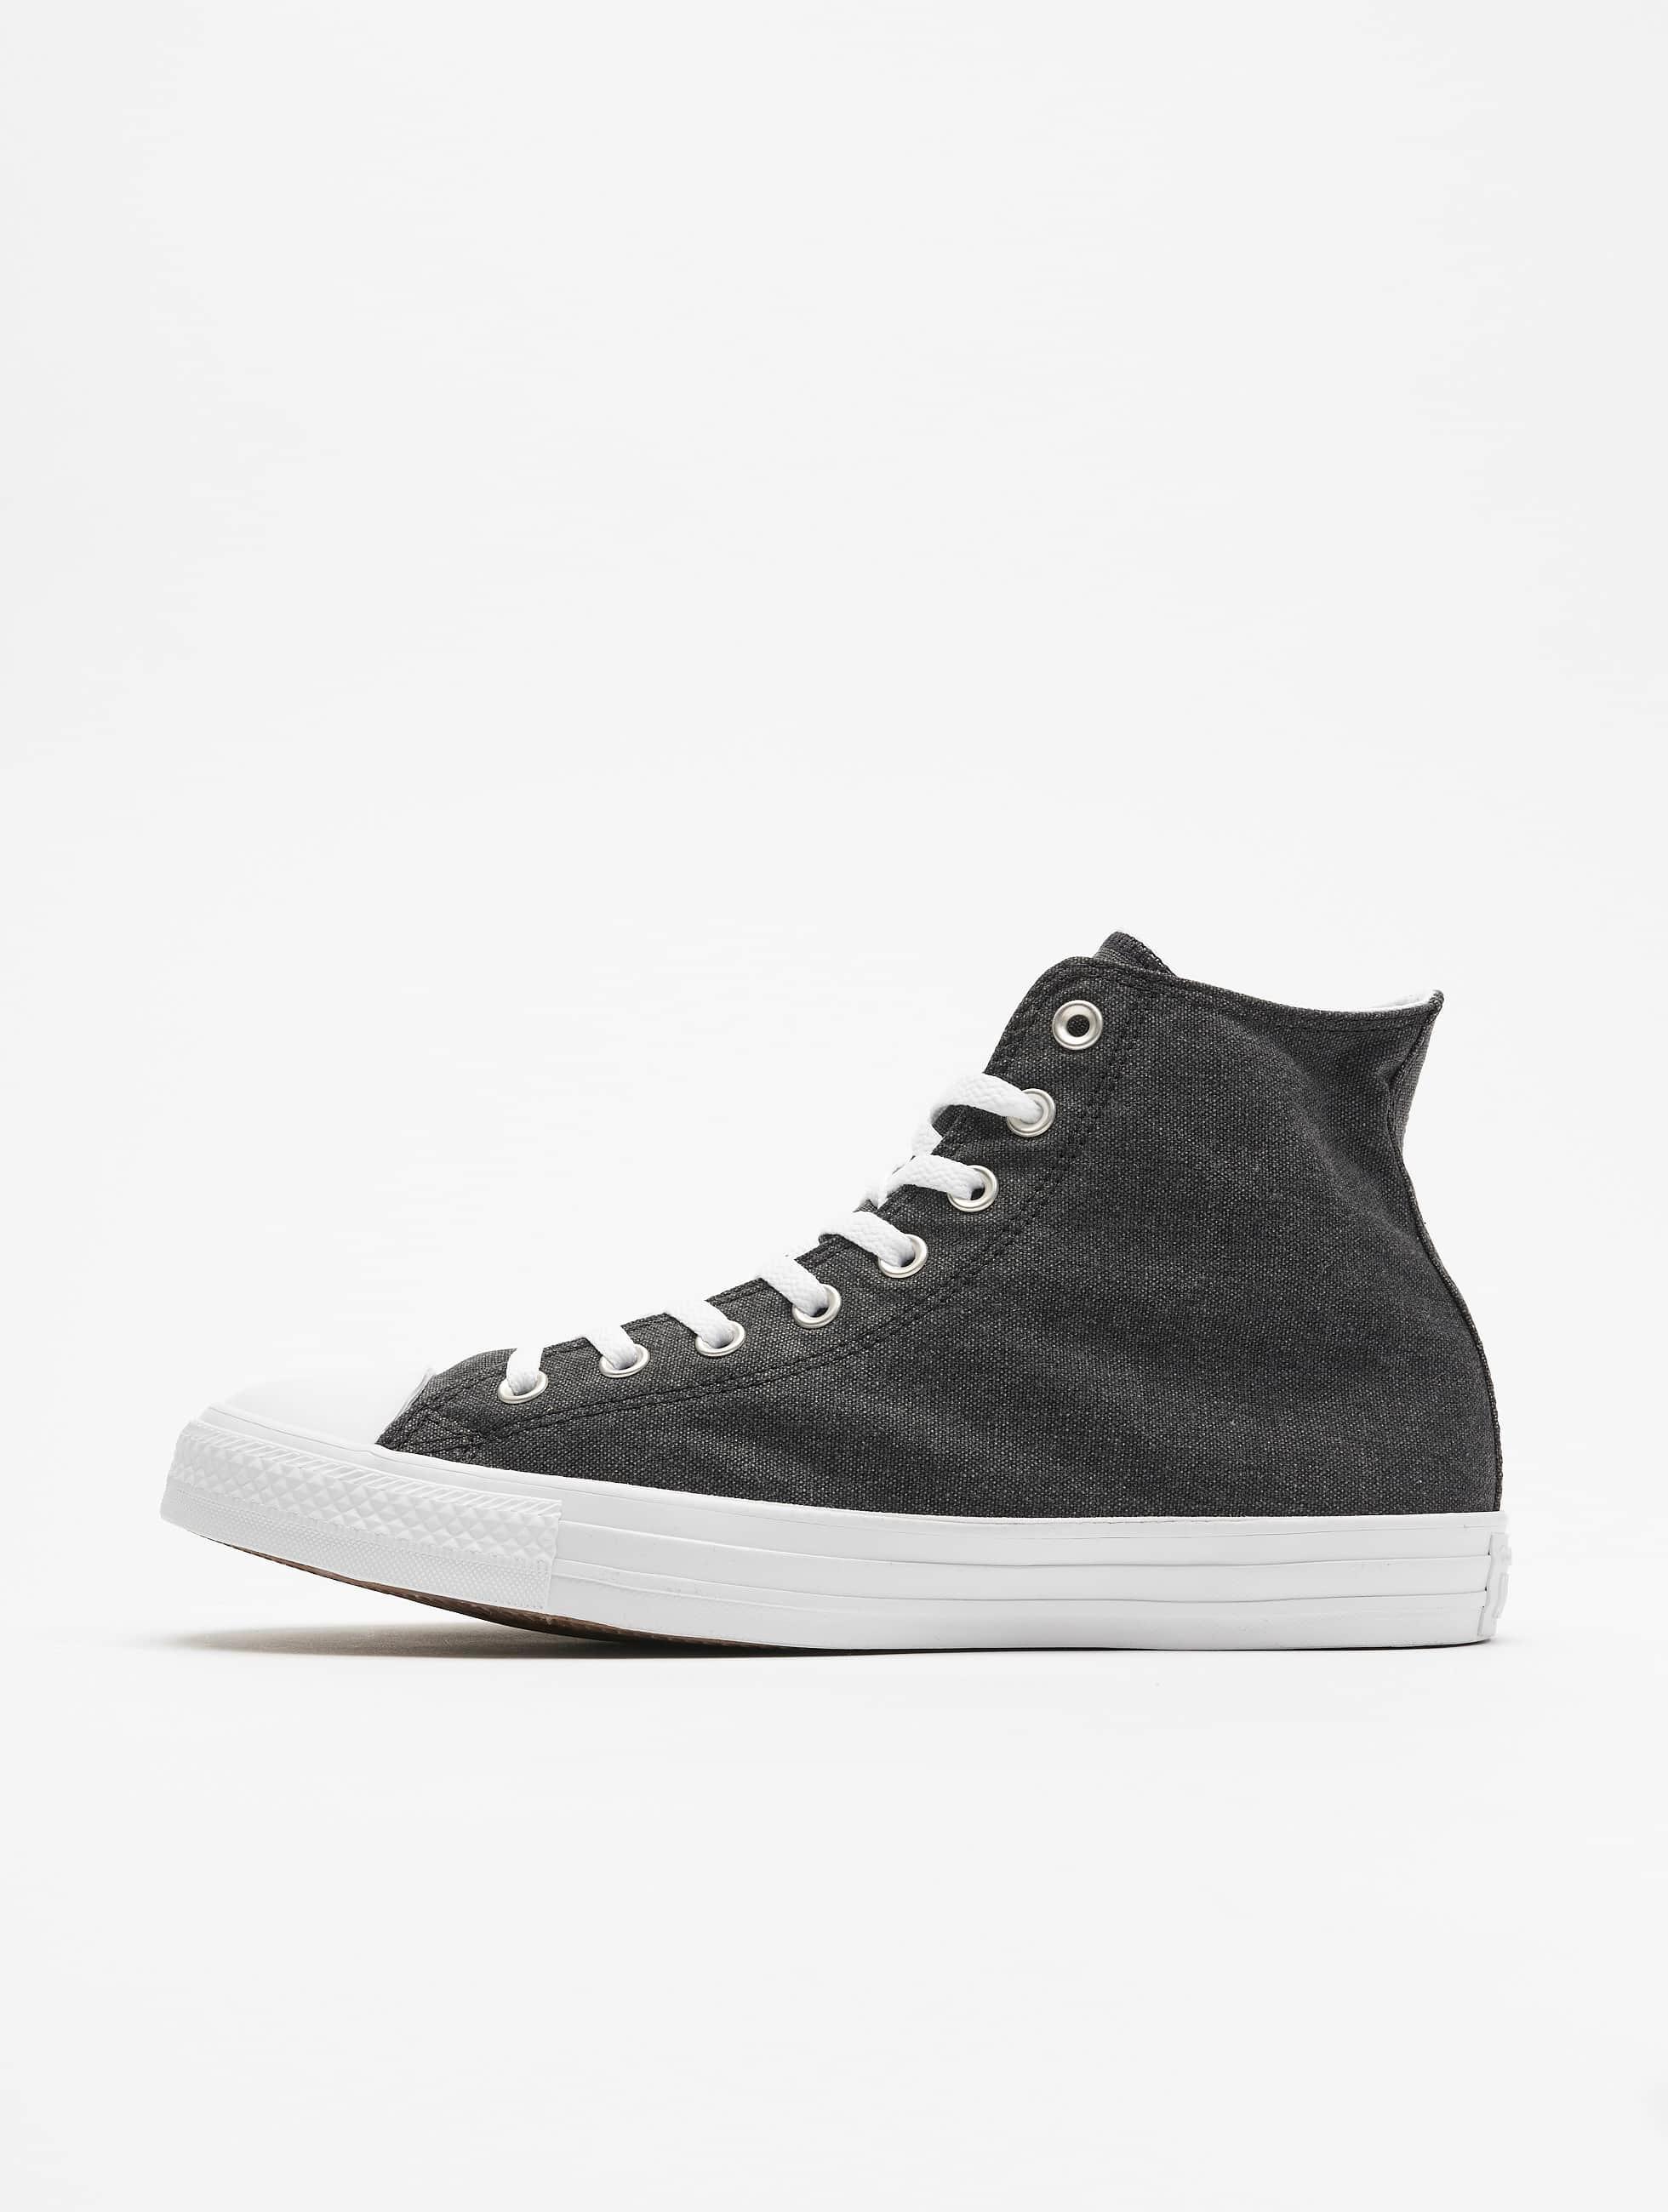 Converse Chuck Taylor All Star Hi Sneakers BlackWhiteWhite